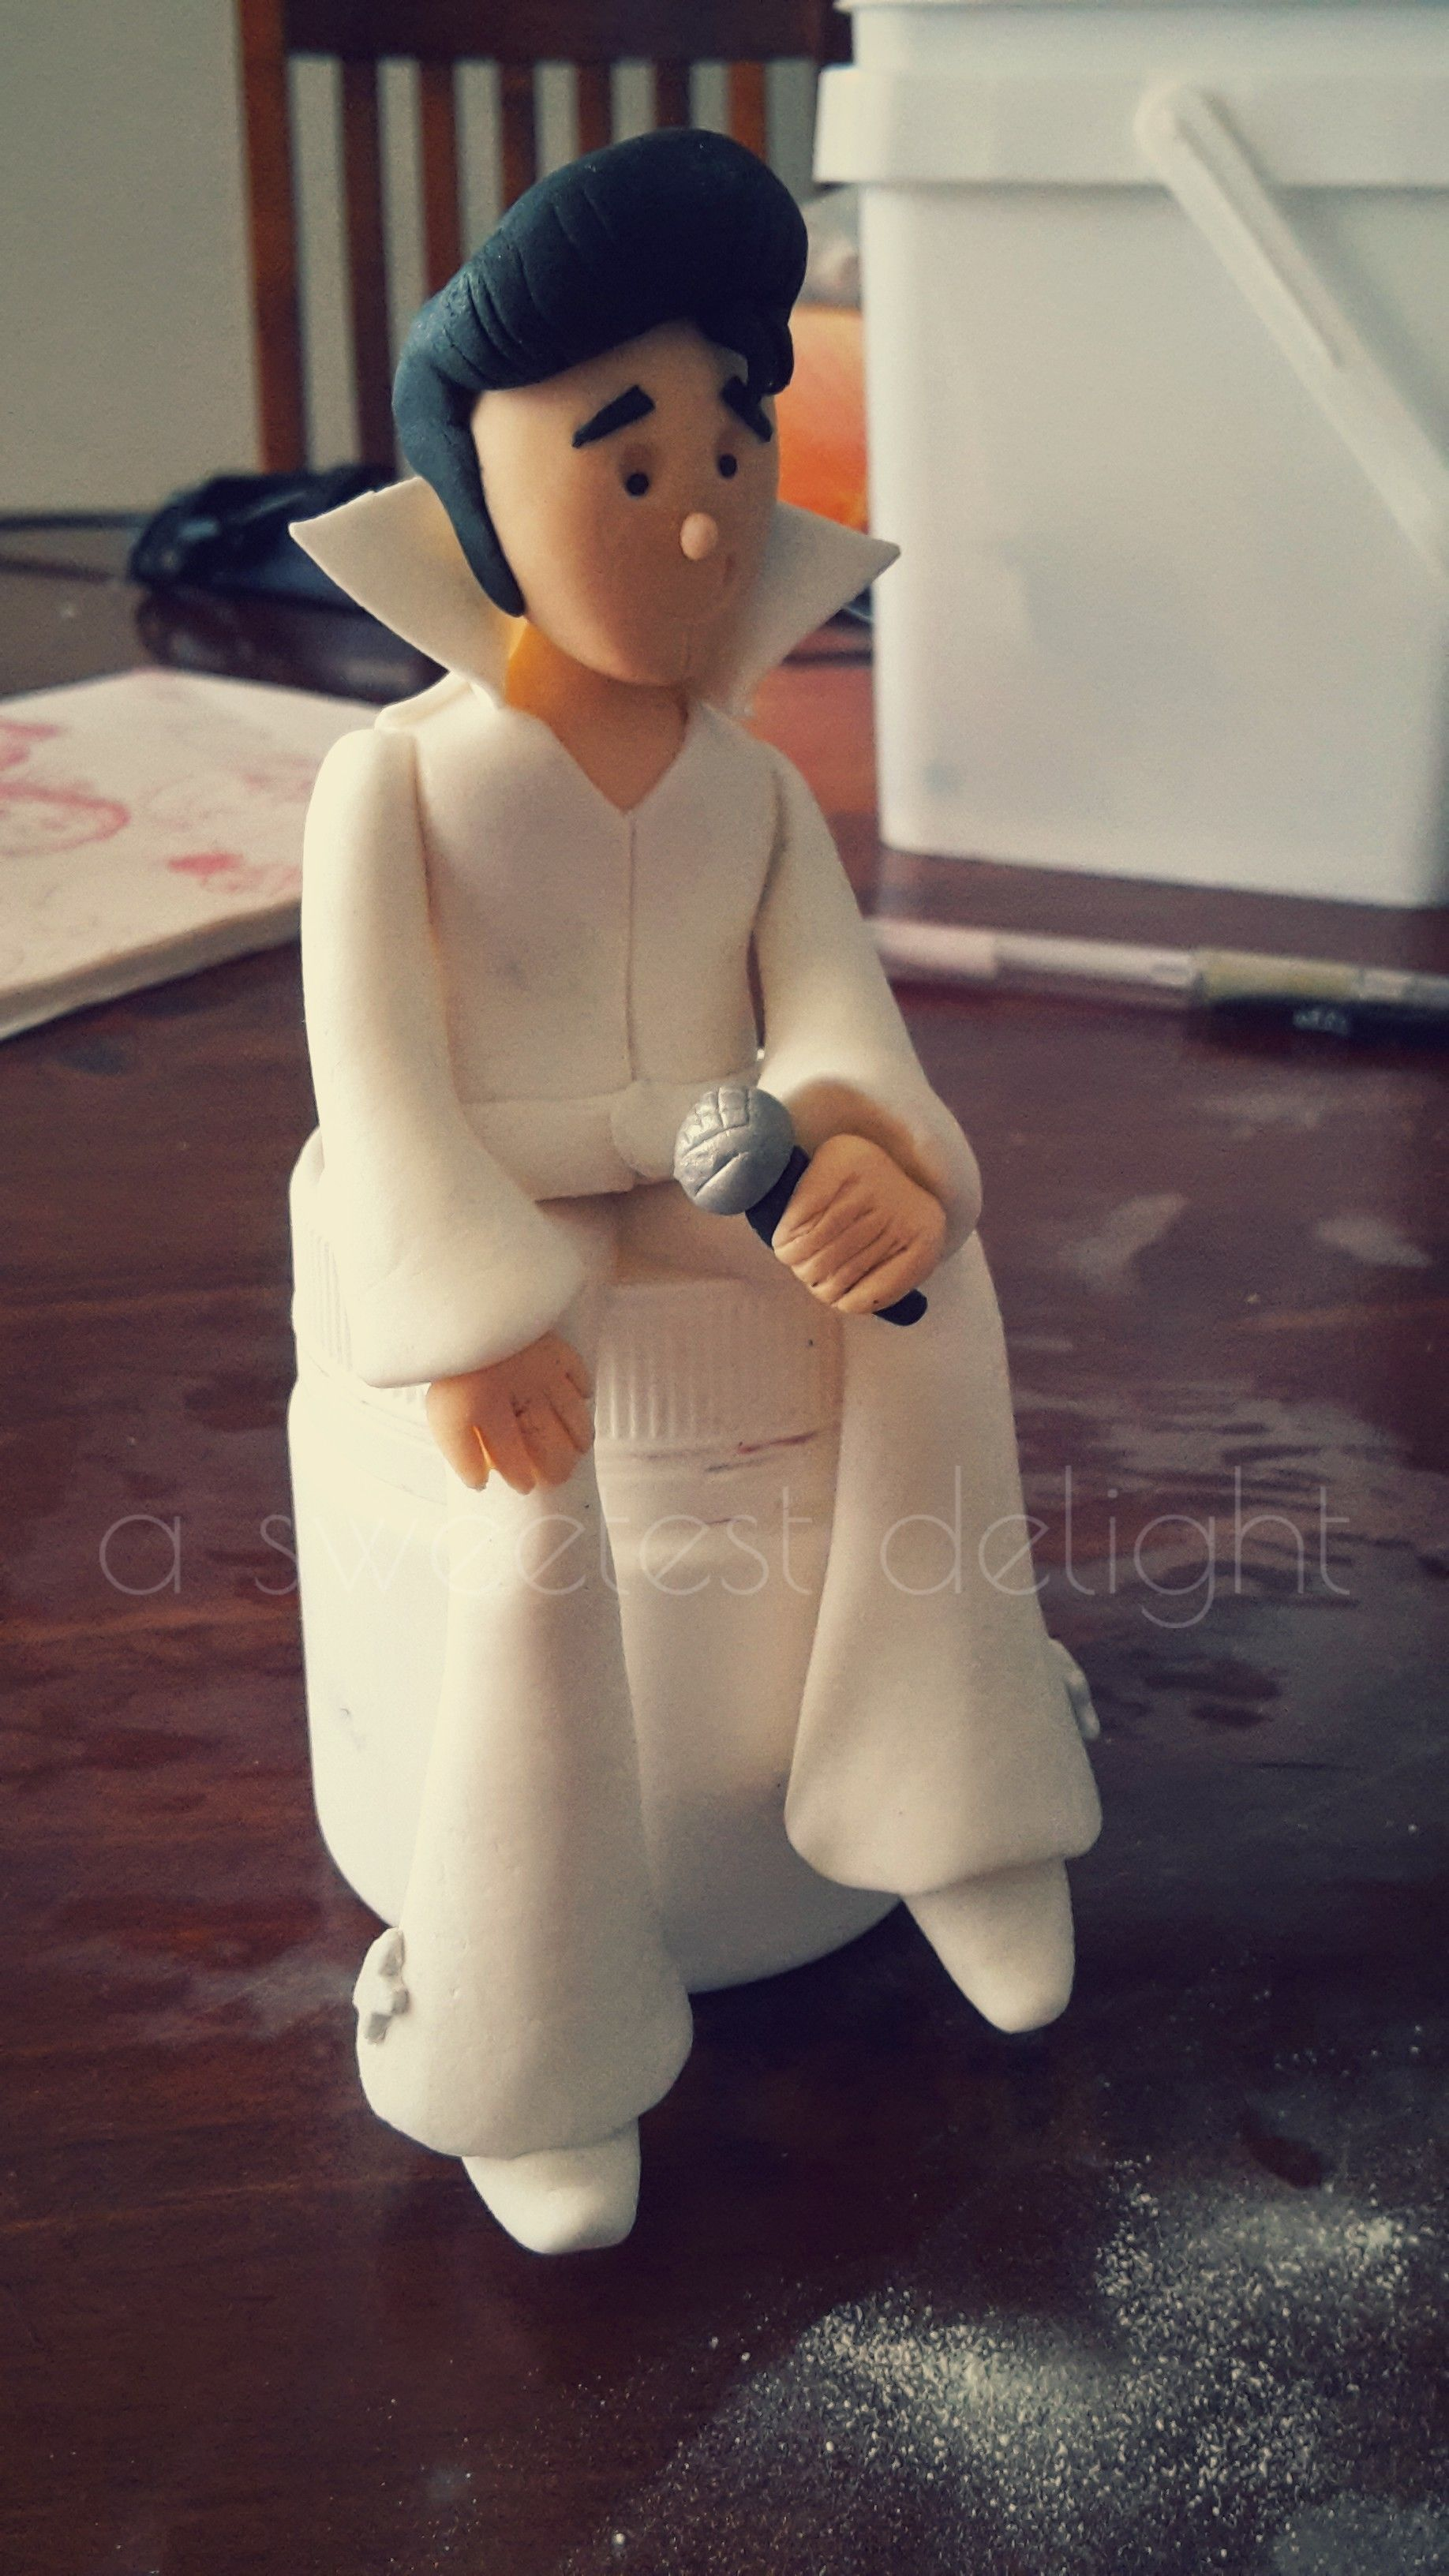 Elvis Presley Gumpaste Fondant Figurine Marzipan Pinterest